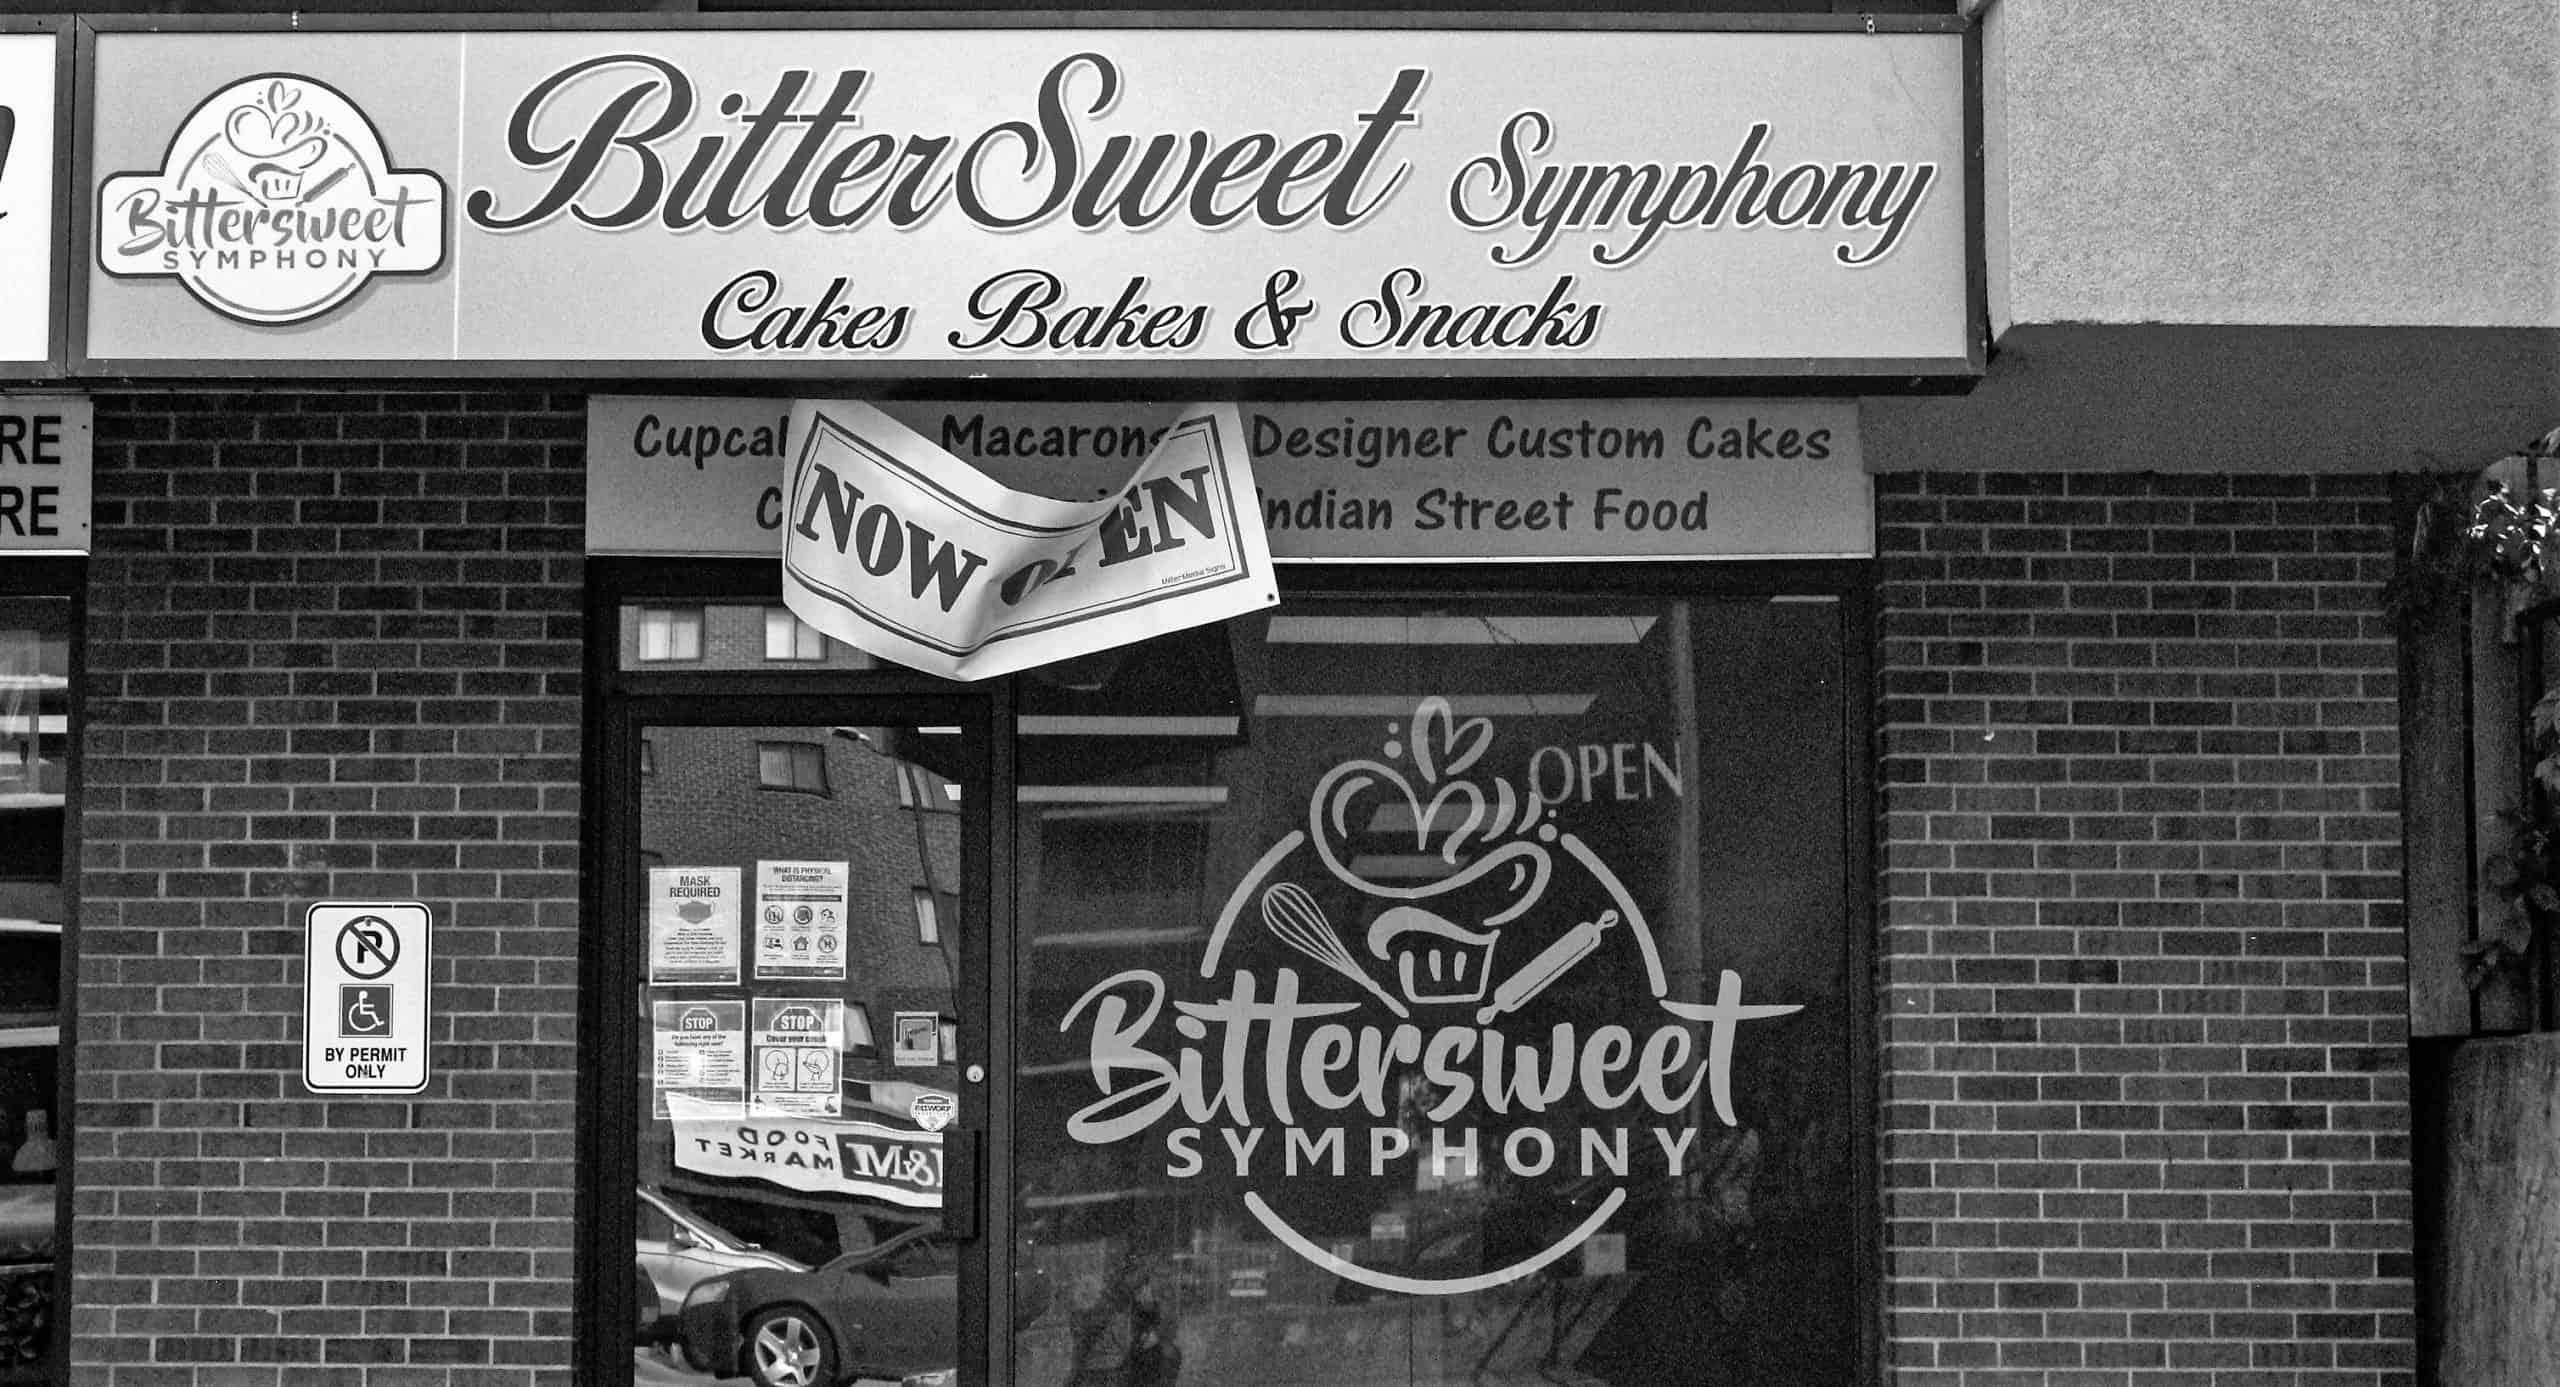 bitter_sweet_symphony_cakes